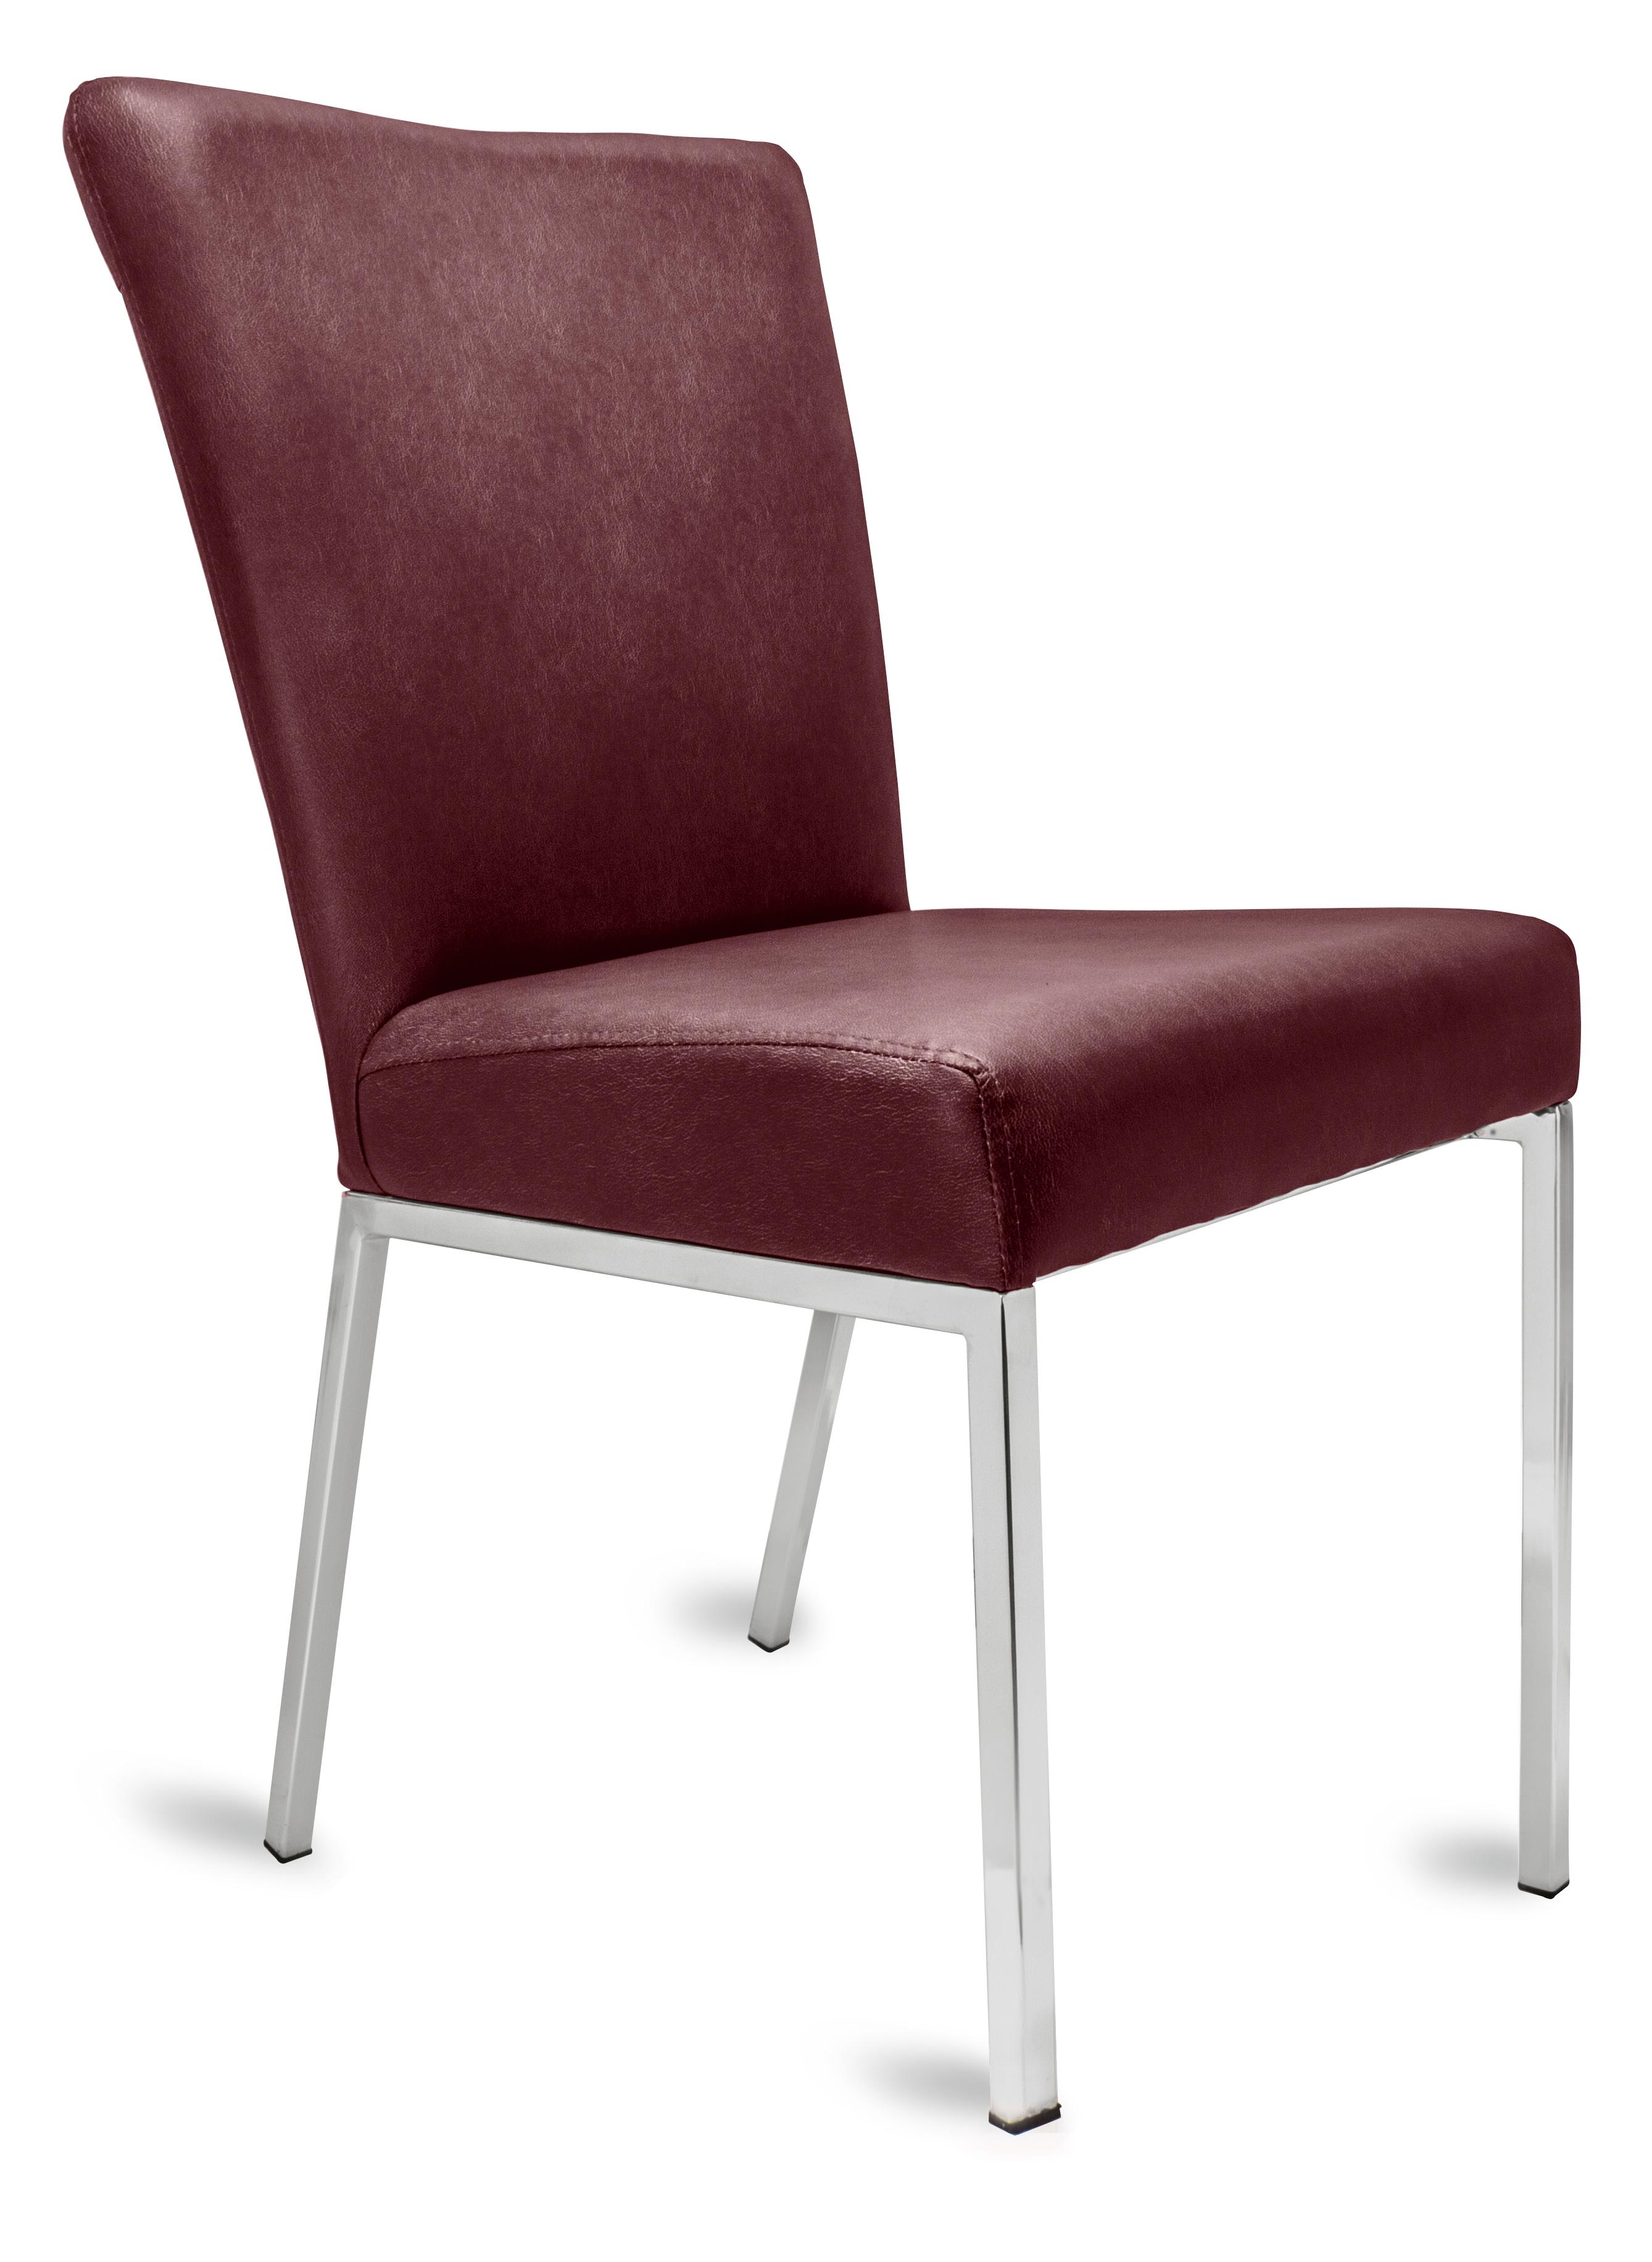 polsterstuhl gala bordeaux metallf e f r gastronomie. Black Bedroom Furniture Sets. Home Design Ideas